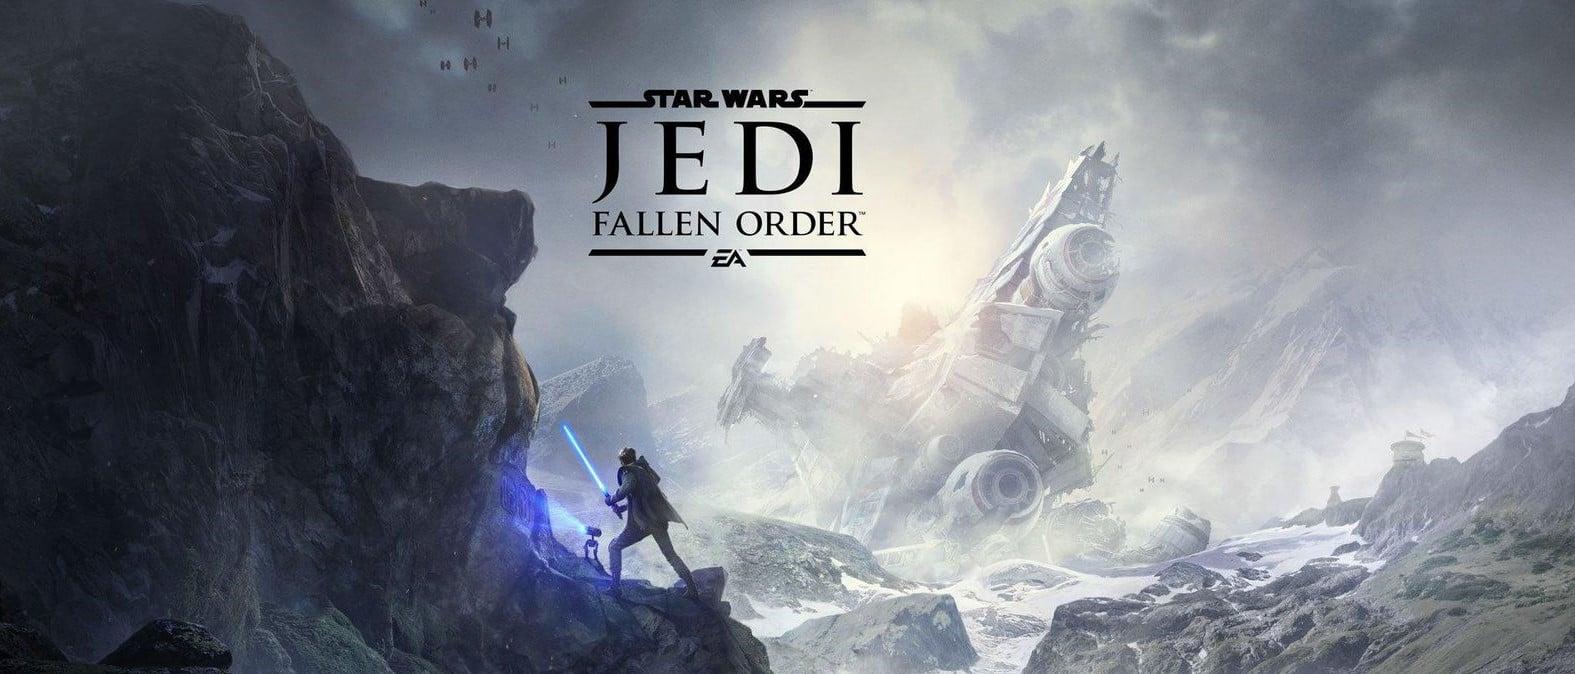 Star Wars Jedi: Upadły Zakon Fallen Order